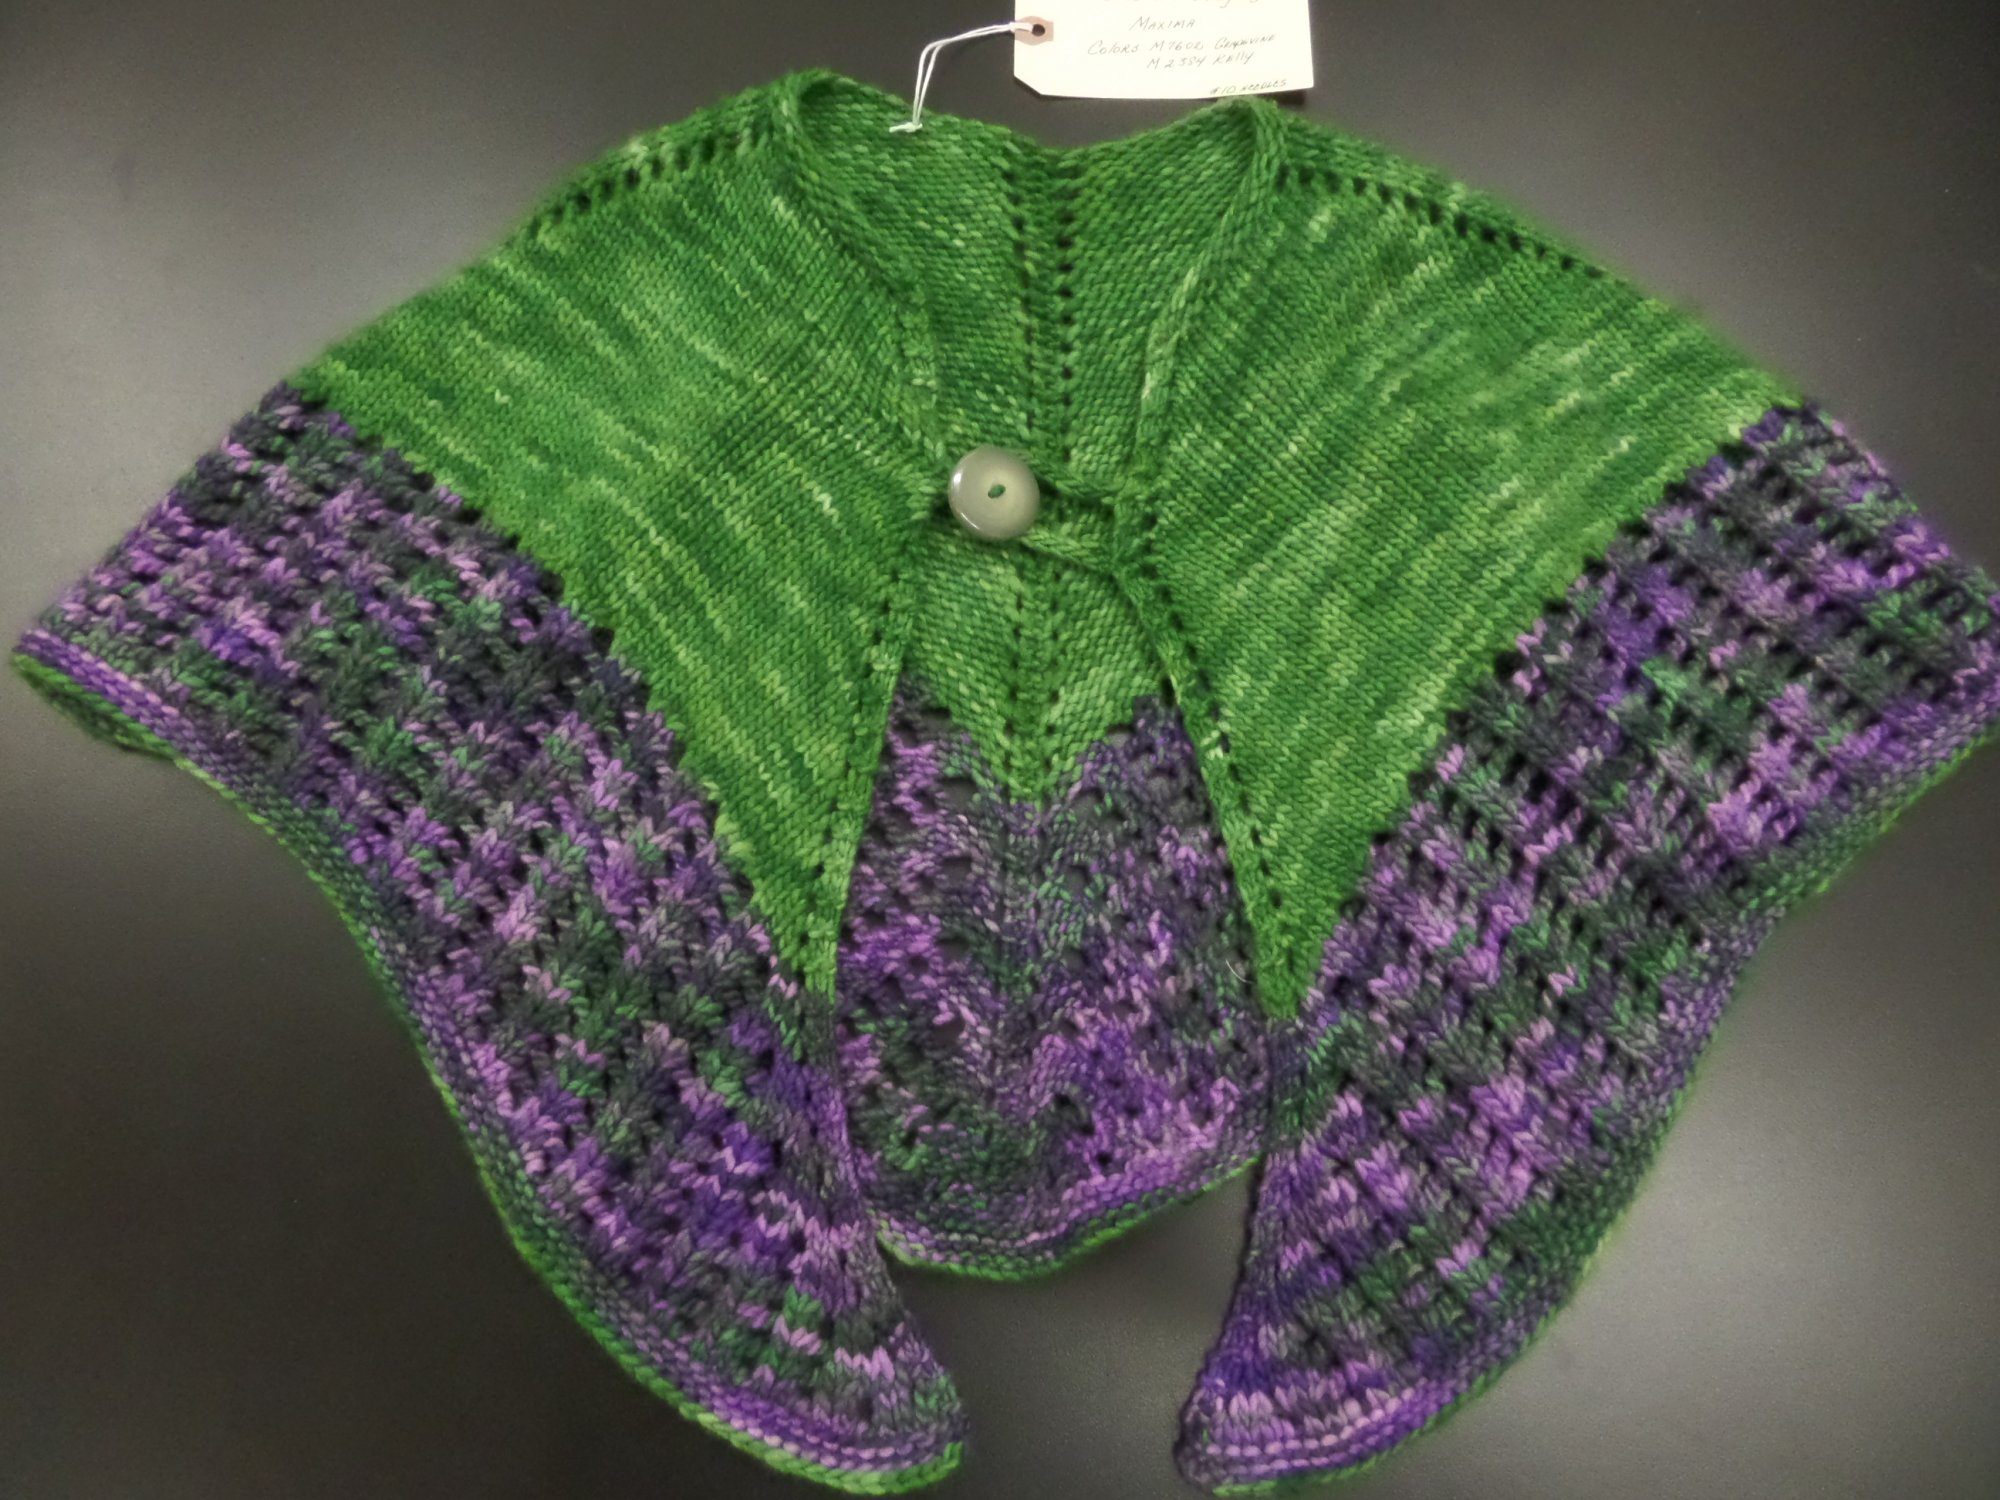 Colonnade shawl model in Maxima yarn from Manos del Uruguay